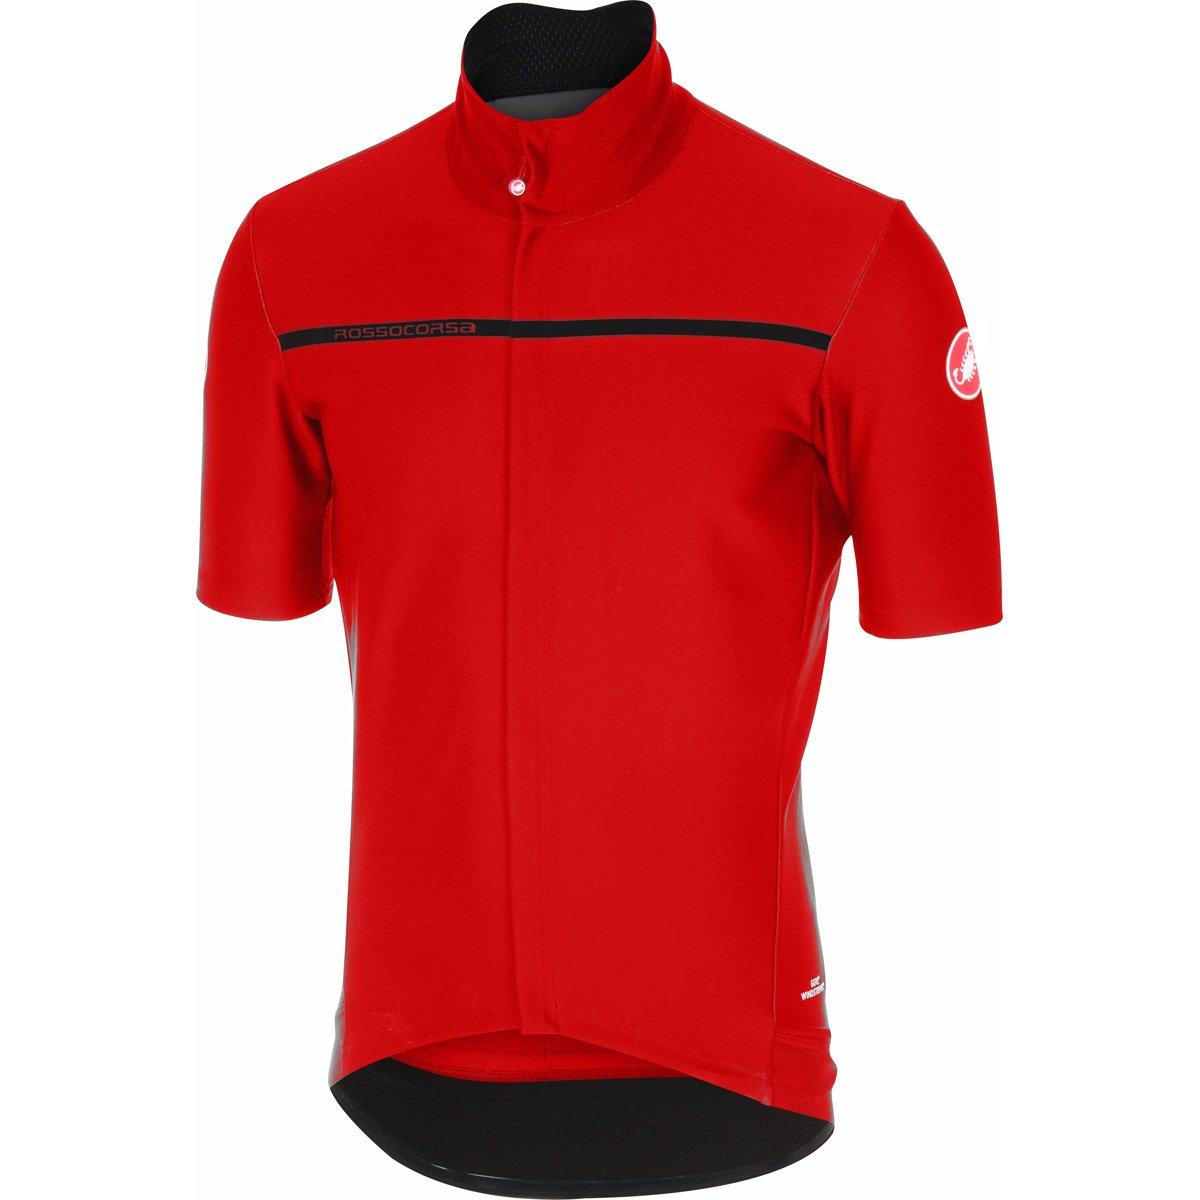 CastelliメンズGabba 3半袖サイクリングjacketb17084 B06VVRTGWK X-Large|レッド レッド X-Large